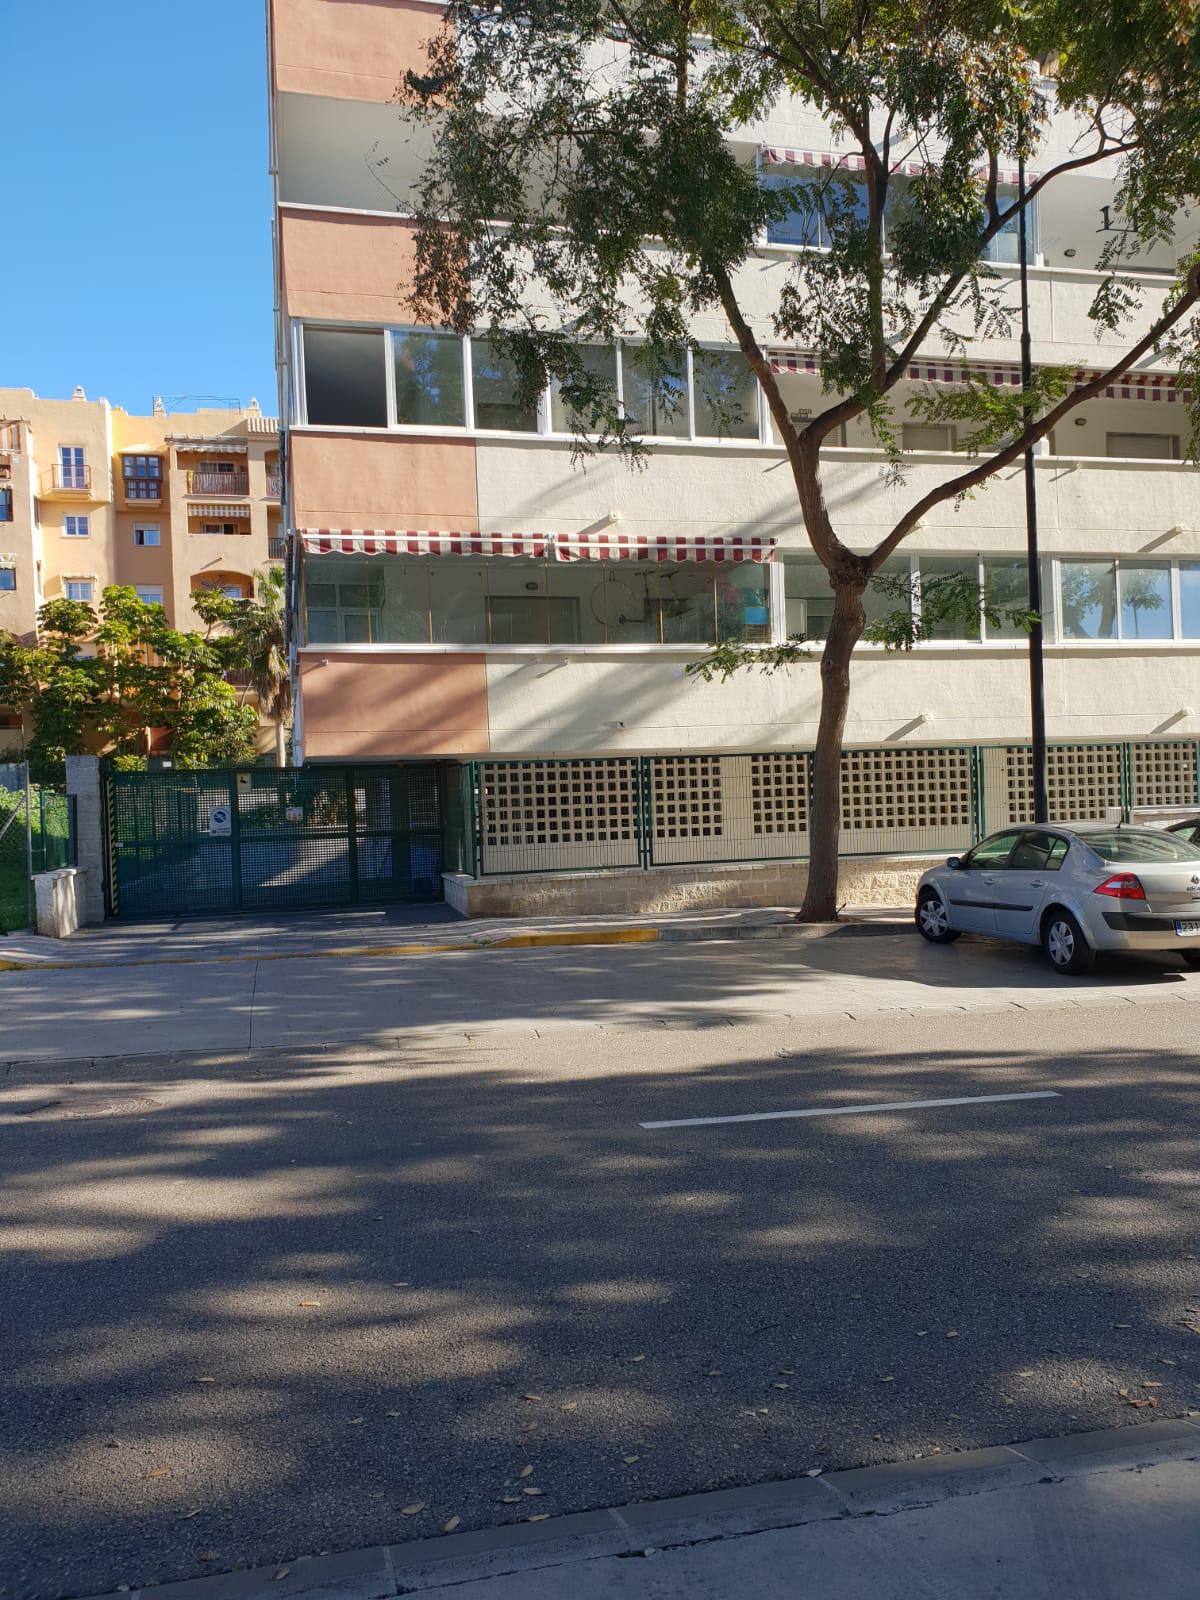 New Development in Los Pacos, Costa del Sol